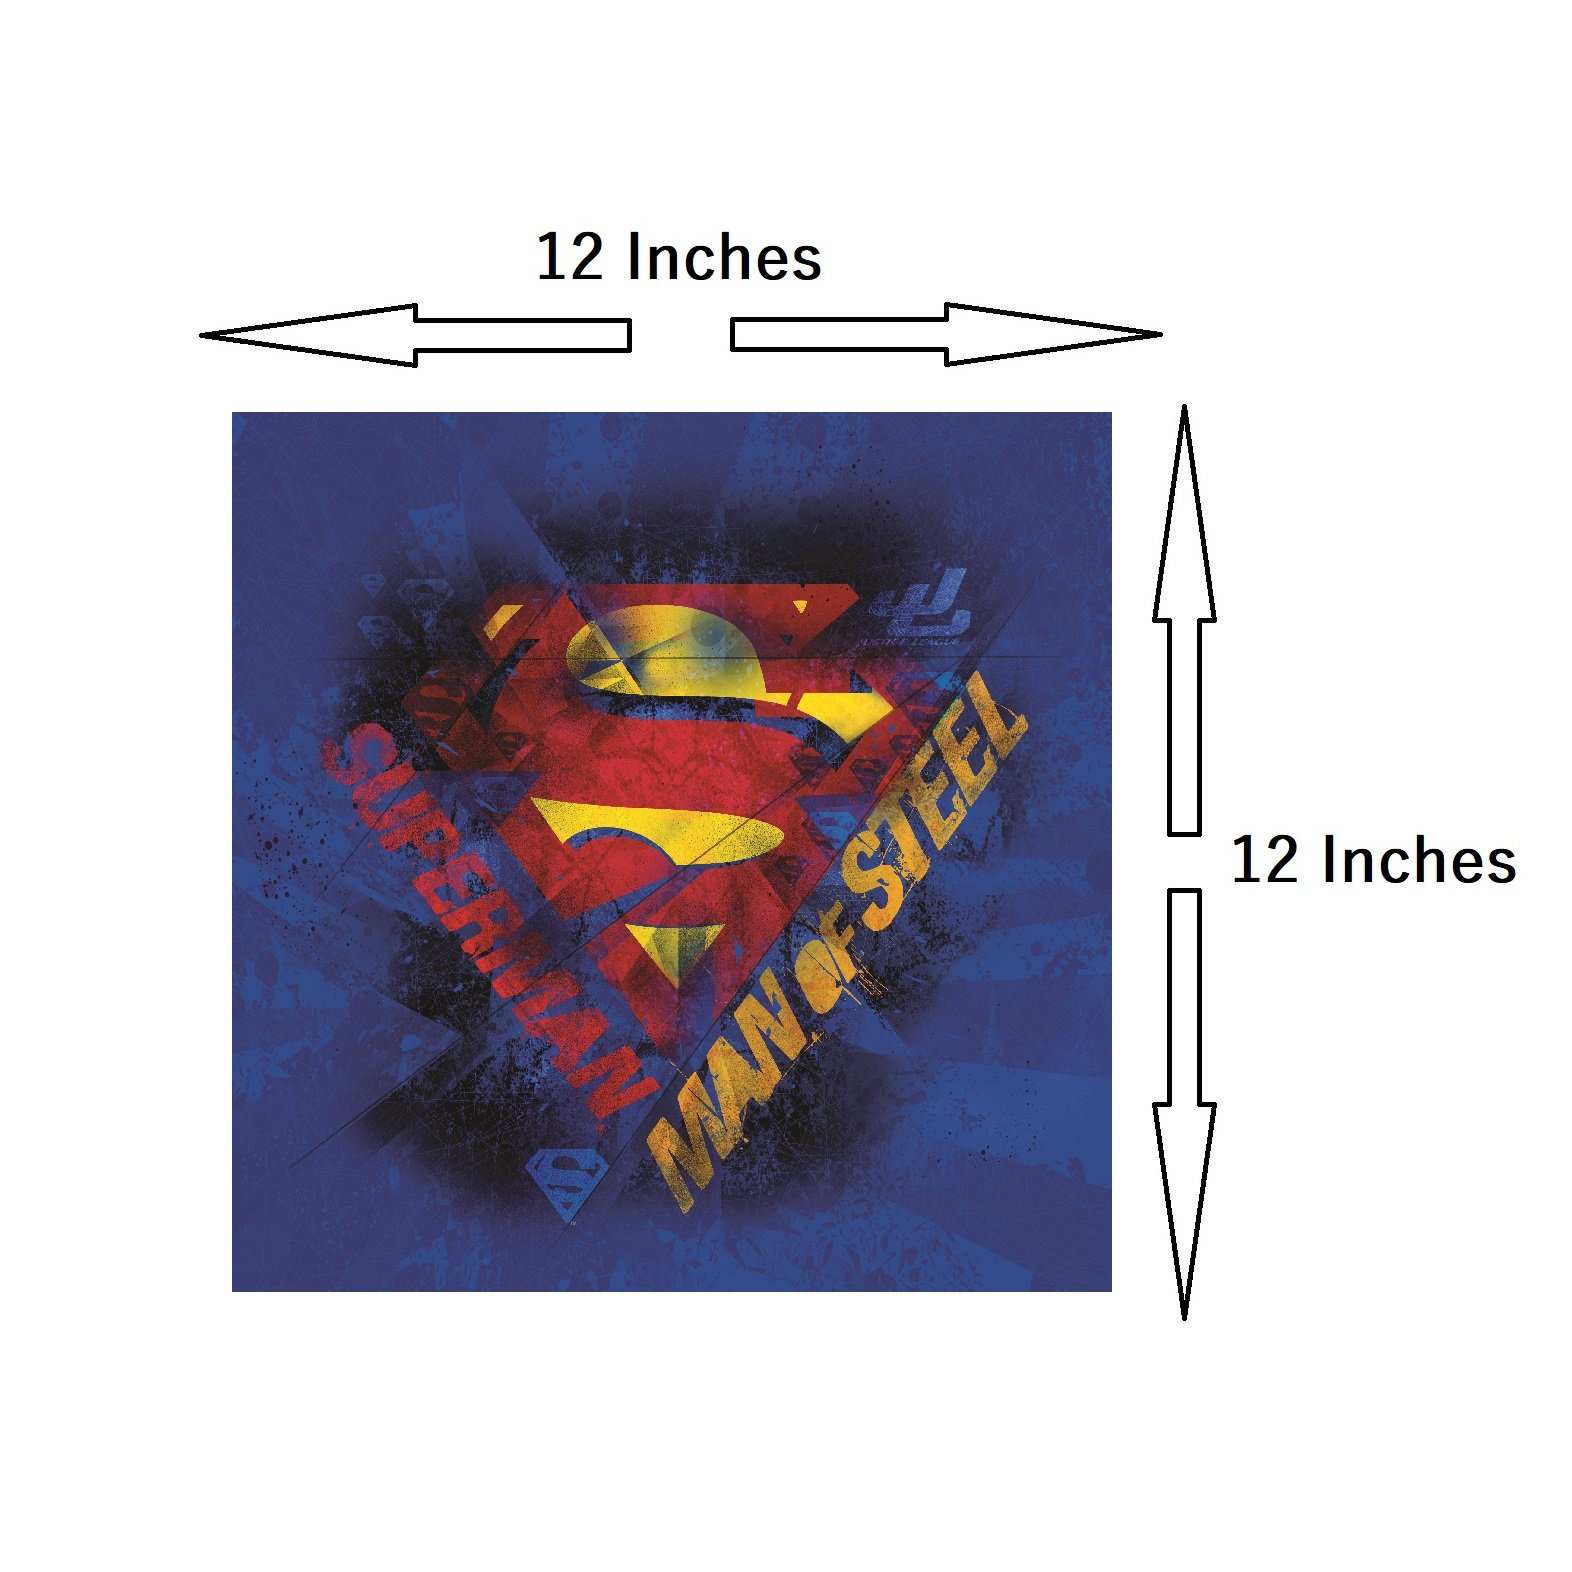 Modern Littles Justice League 5 Piece Canvas Wall Art Set Featuring Superhero Character Designs of Superman, Batman, Green Lantern and Flash Gordon, Multicolored by Modern Littles (Image #3)